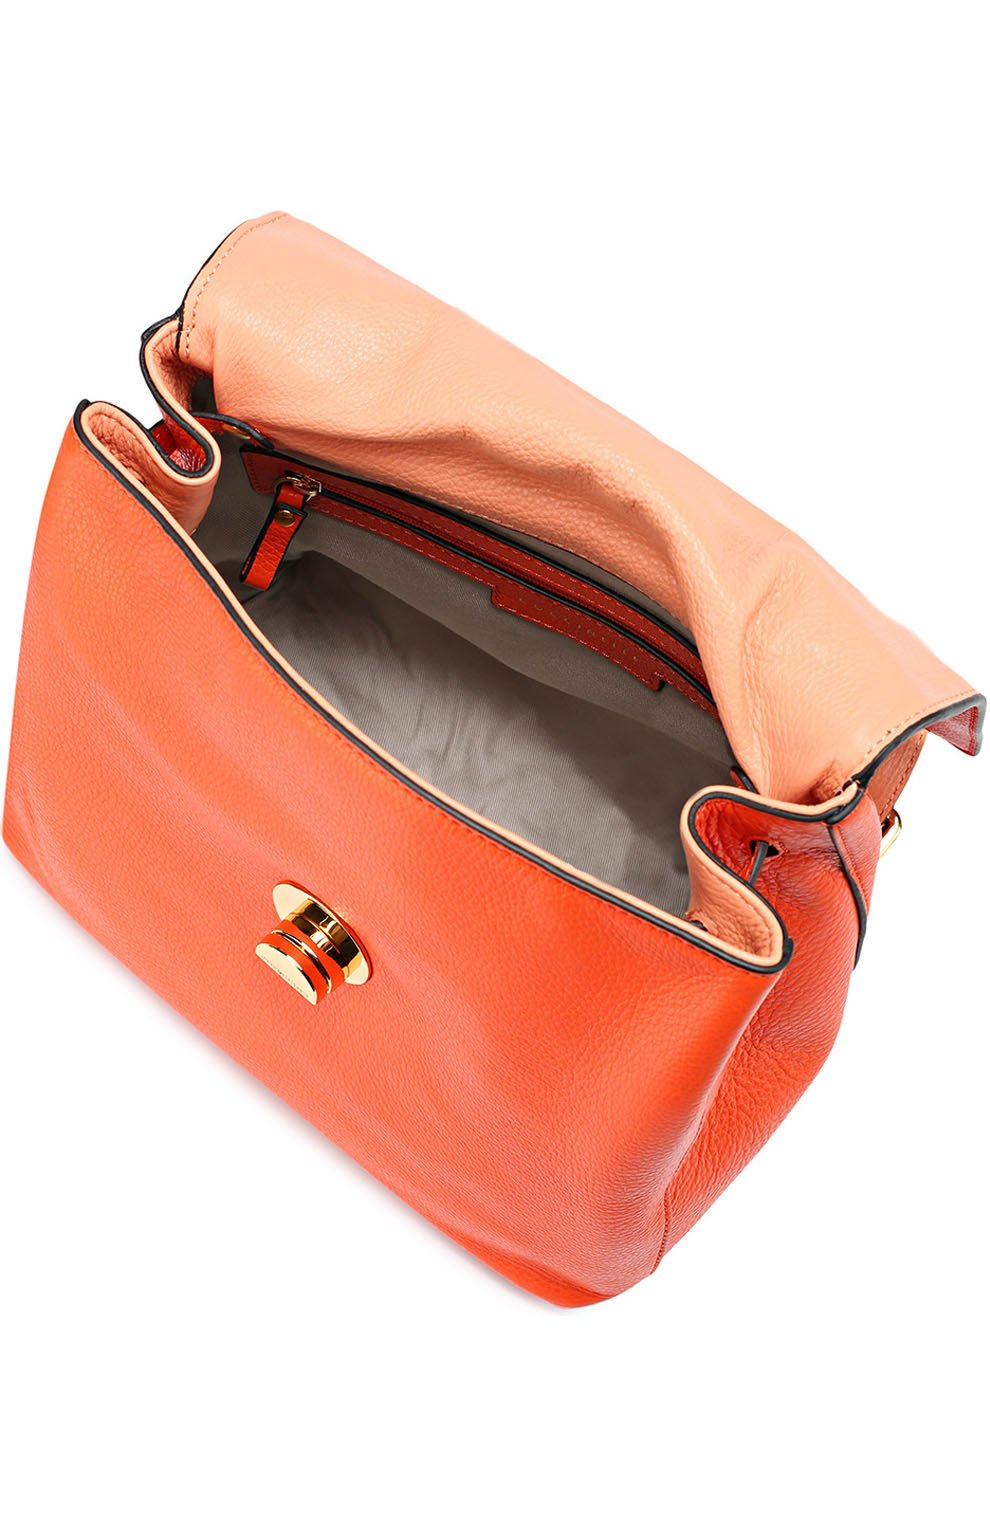 Кожаный рюкзак Liya | Фото №4